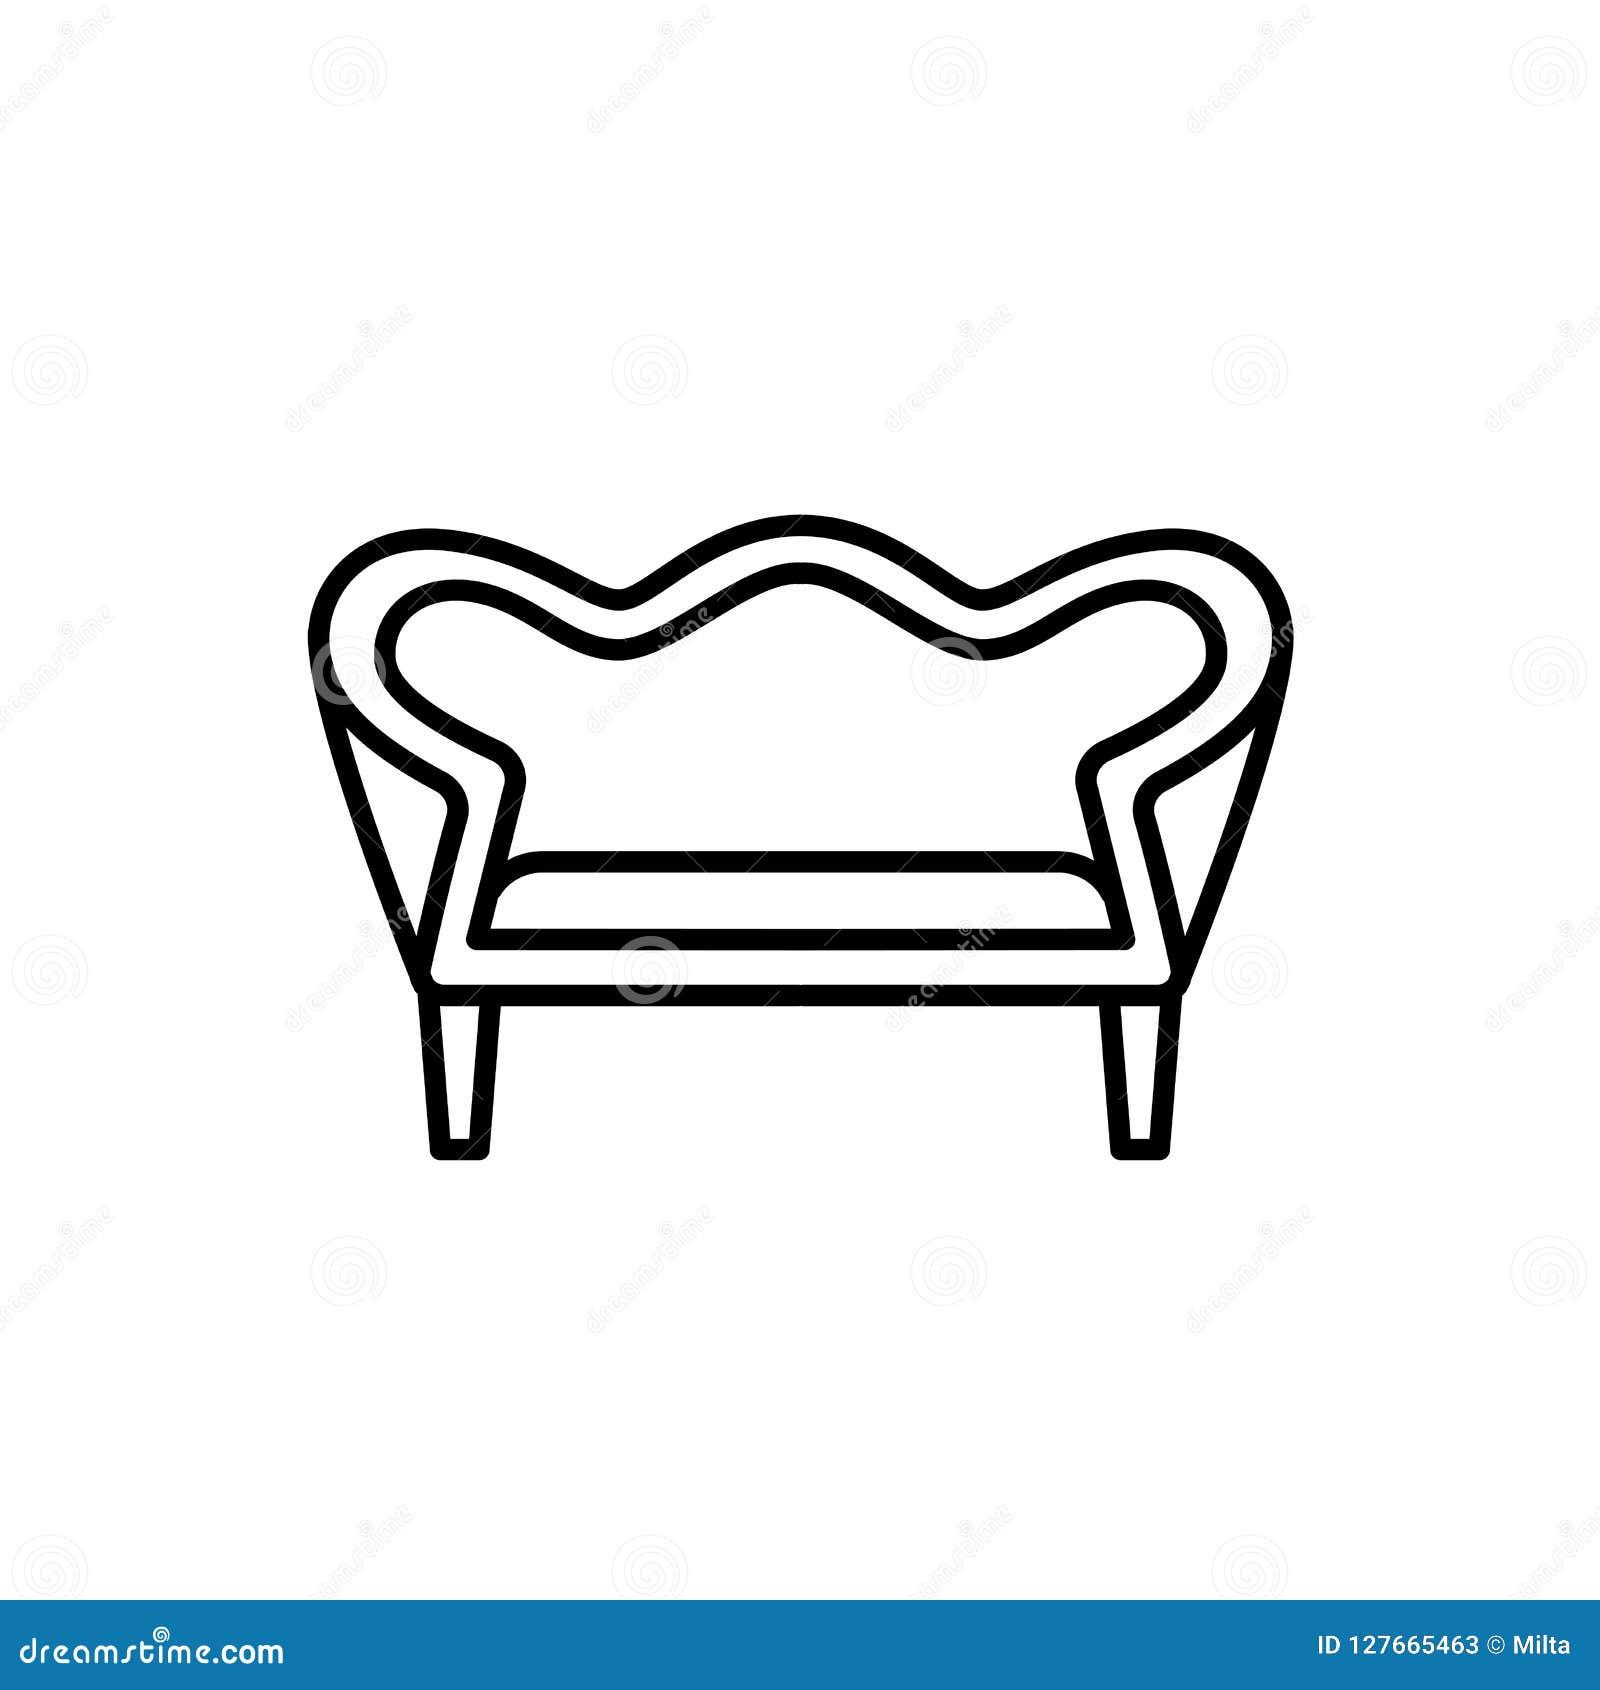 Groovy Black White Vector Illustration Of Vintage Loveseat Machost Co Dining Chair Design Ideas Machostcouk